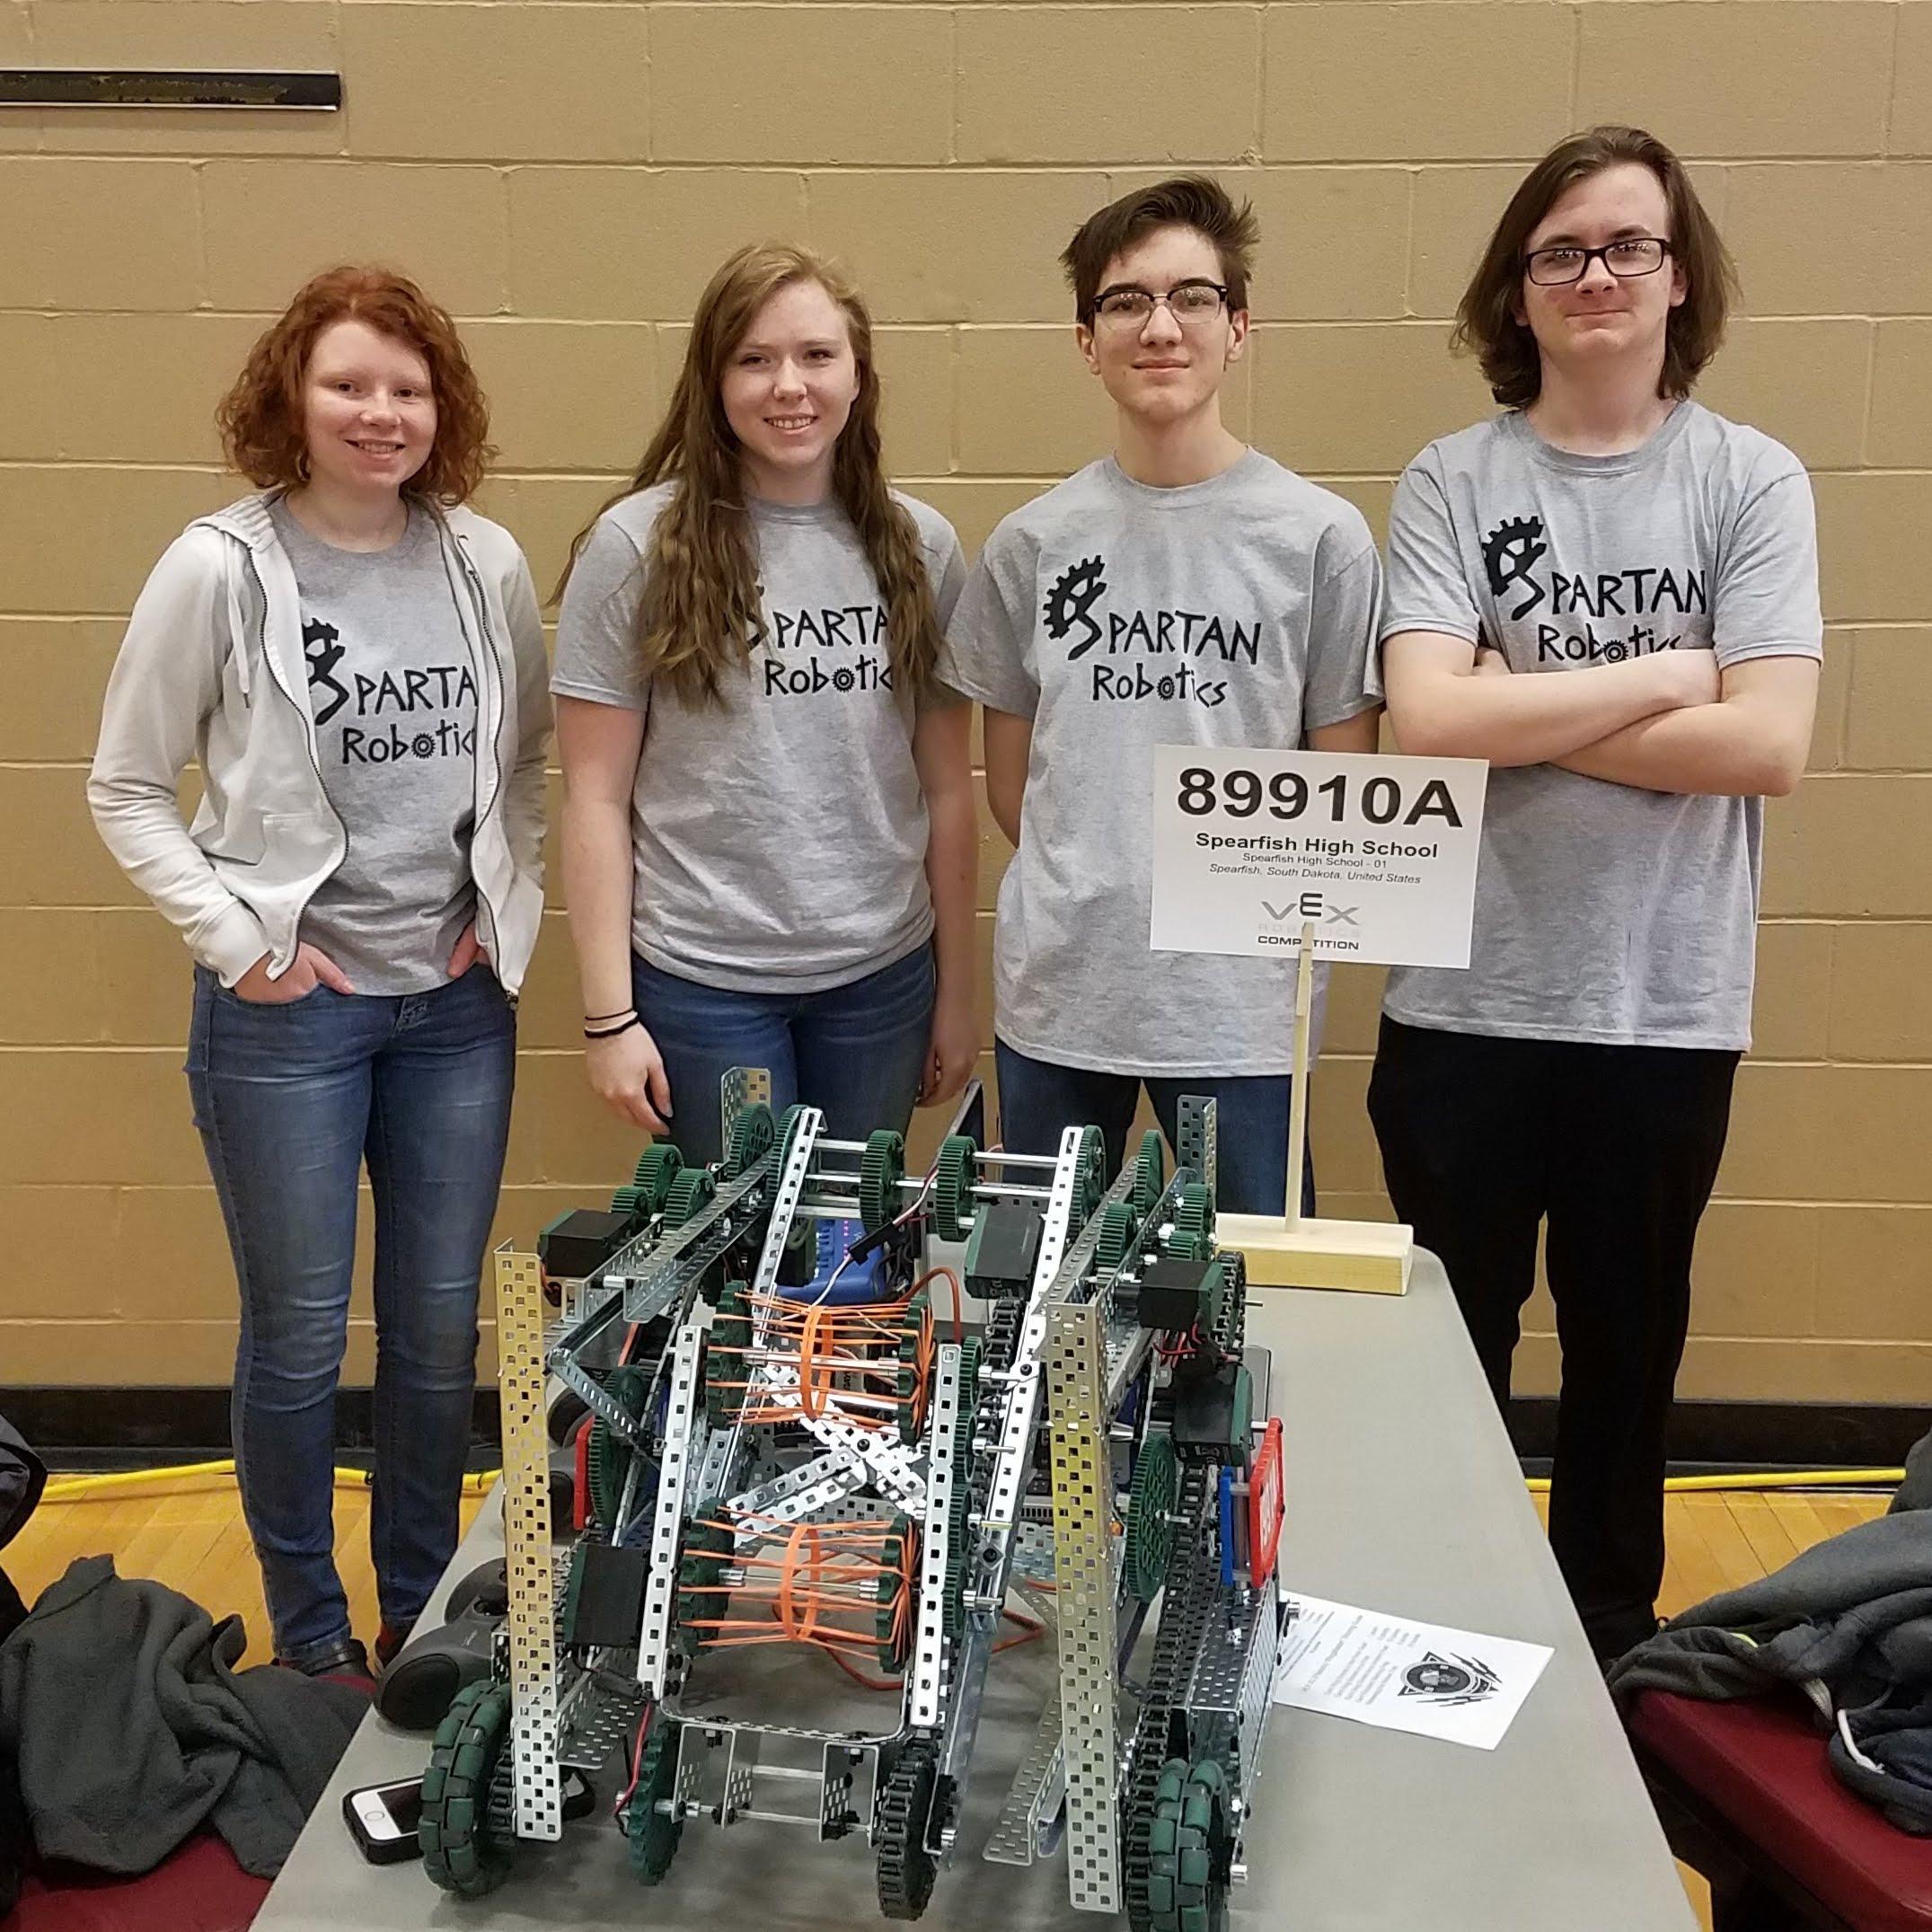 Spearfish High School Robotics